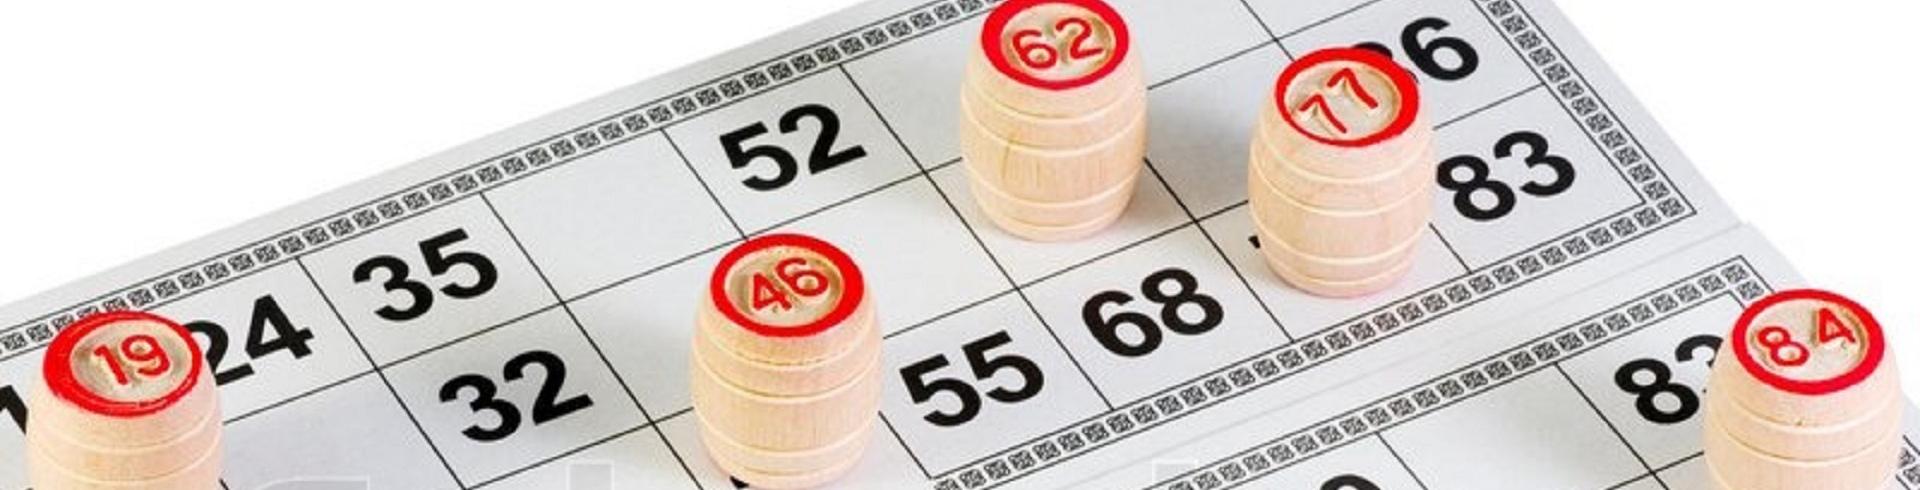 Lottozahlen Dezember 2021